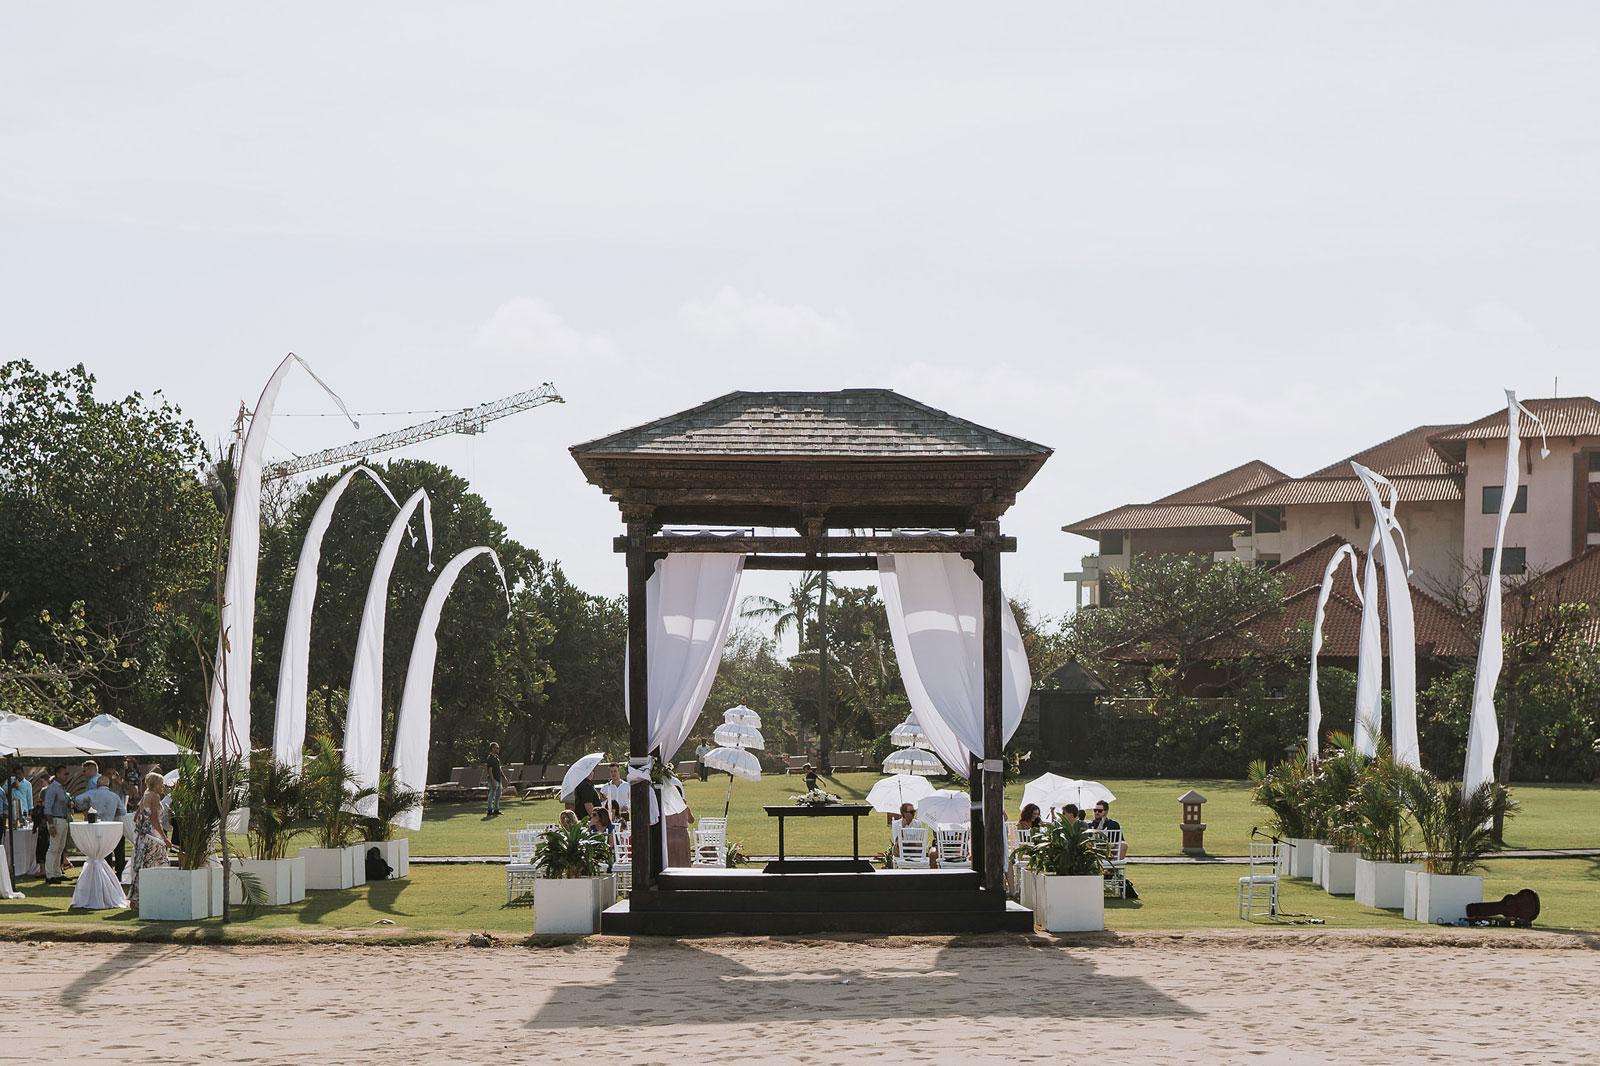 newfound-j-j-bali-nusa-dua-wedding-wedding-photographer-042-a